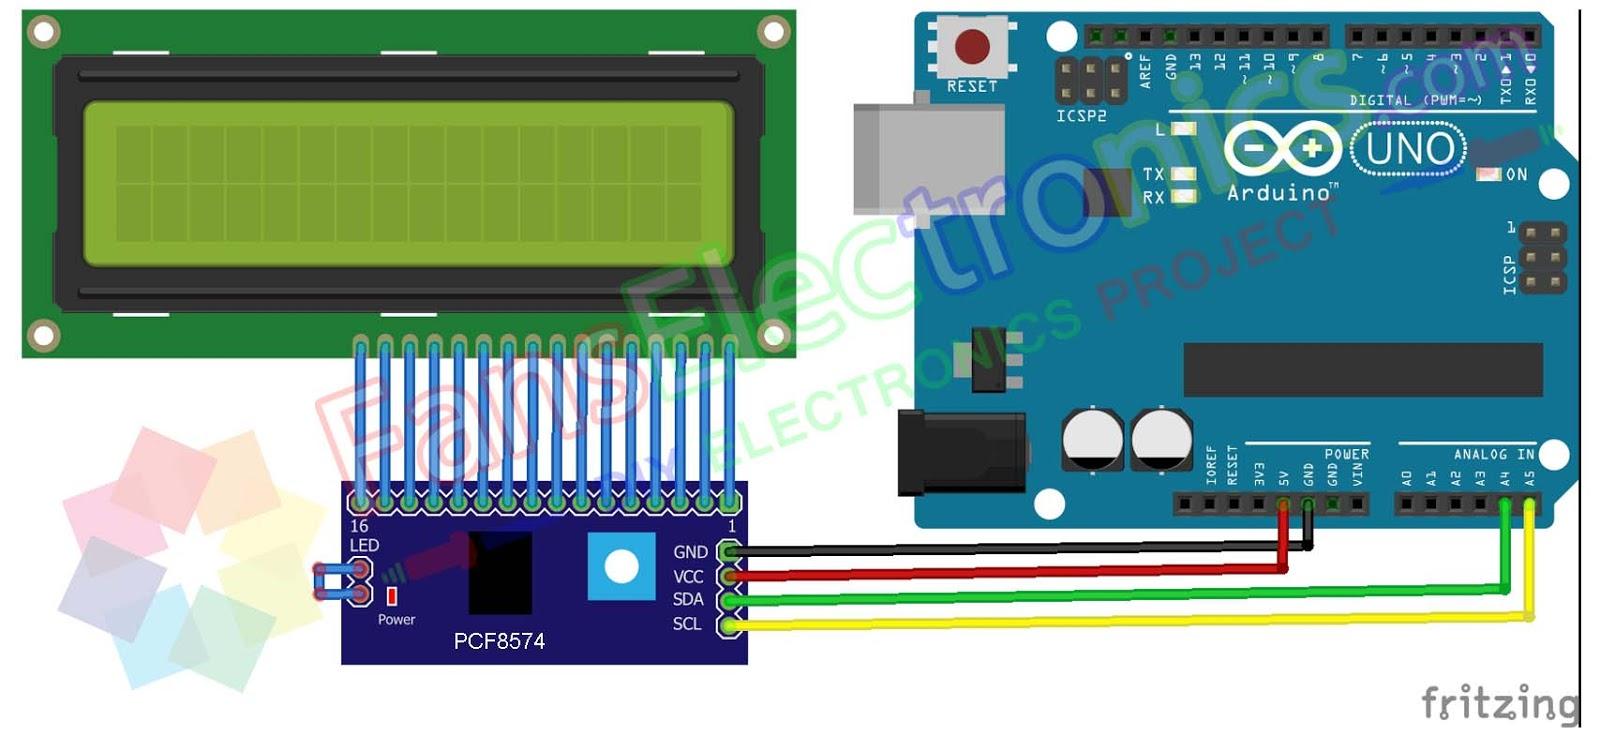 Blog Fans Electronics Belajar Arduino Elektronika Website Ds1307 Adalah Sebuah Icintegrated Circuit Jenis Rtcreal Time Clock Proses Pengerjaan